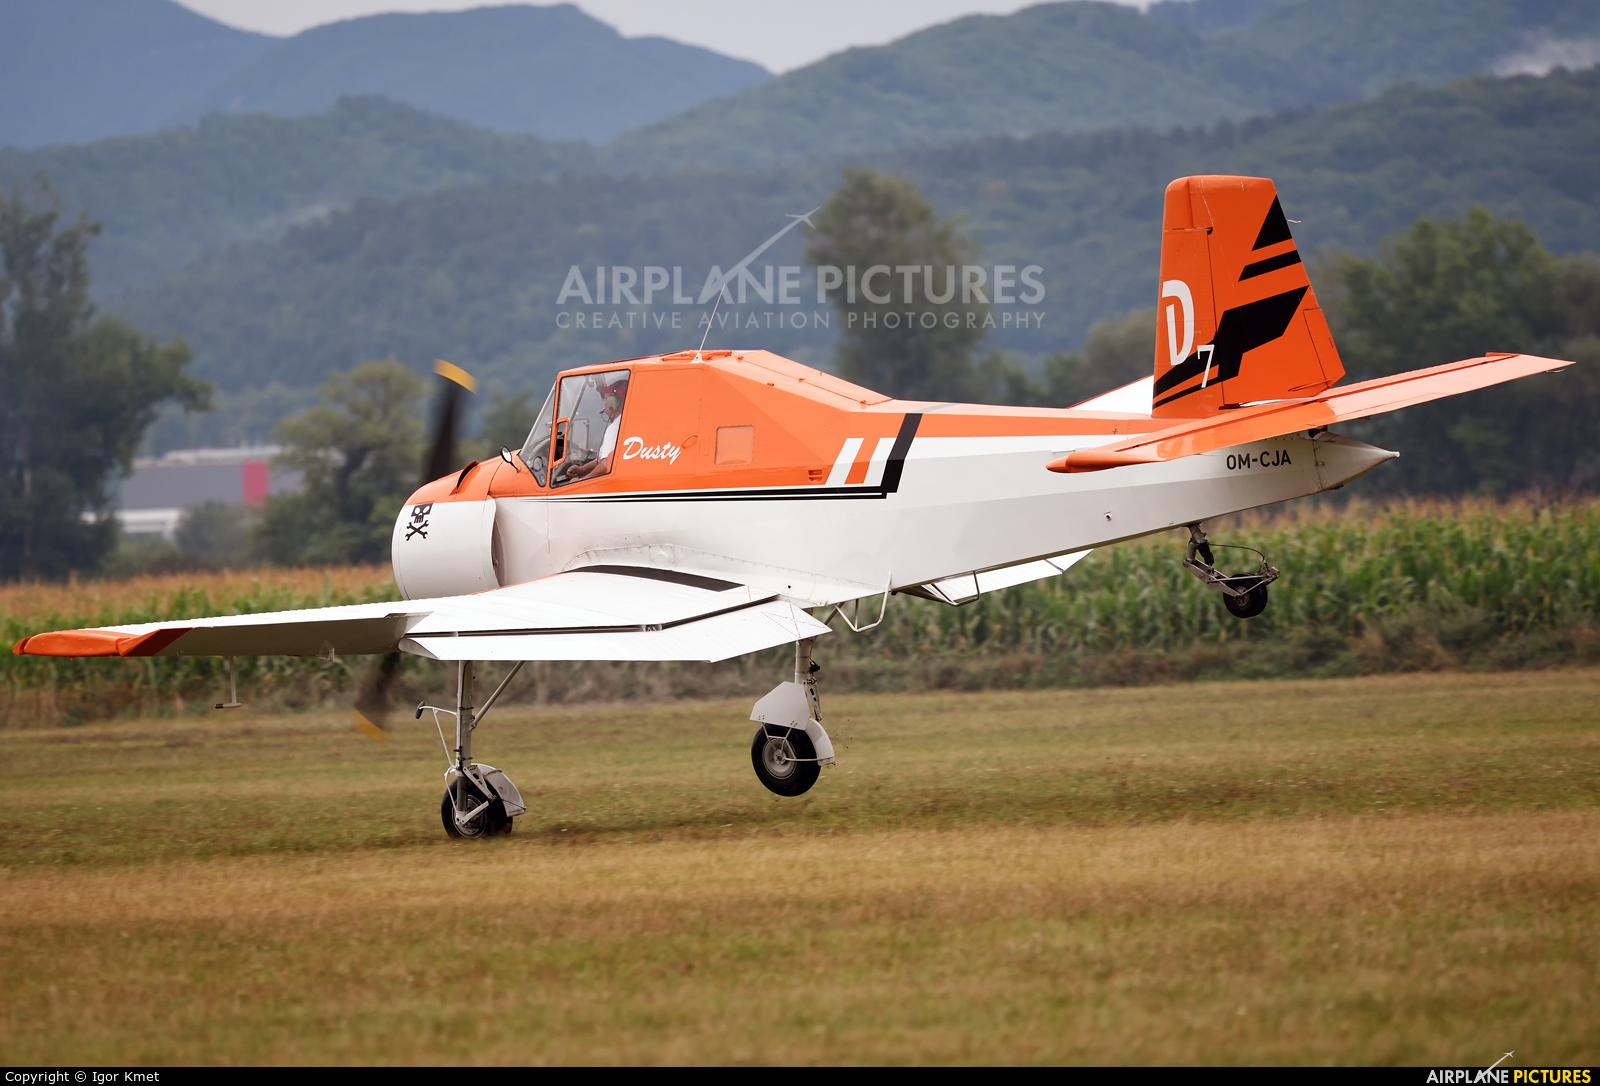 Aeroklub Dubnica nad Vahom OM-CJA aircraft at Dubnica nad Vahom - Slavnica